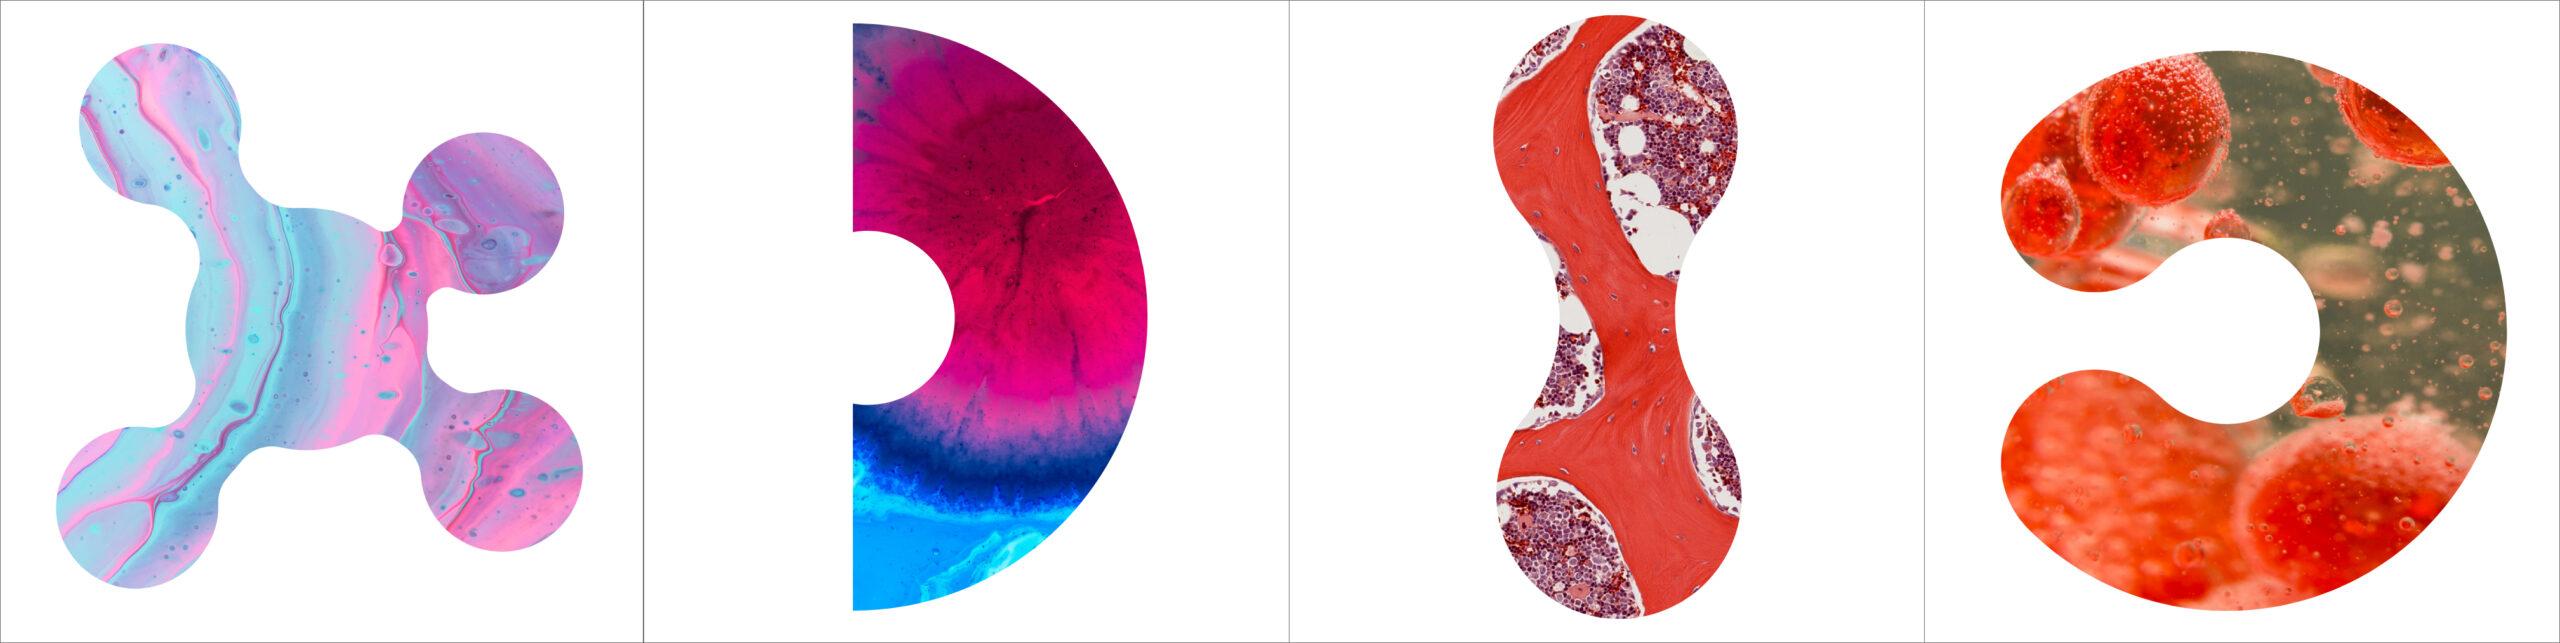 Brand Scientific shapes